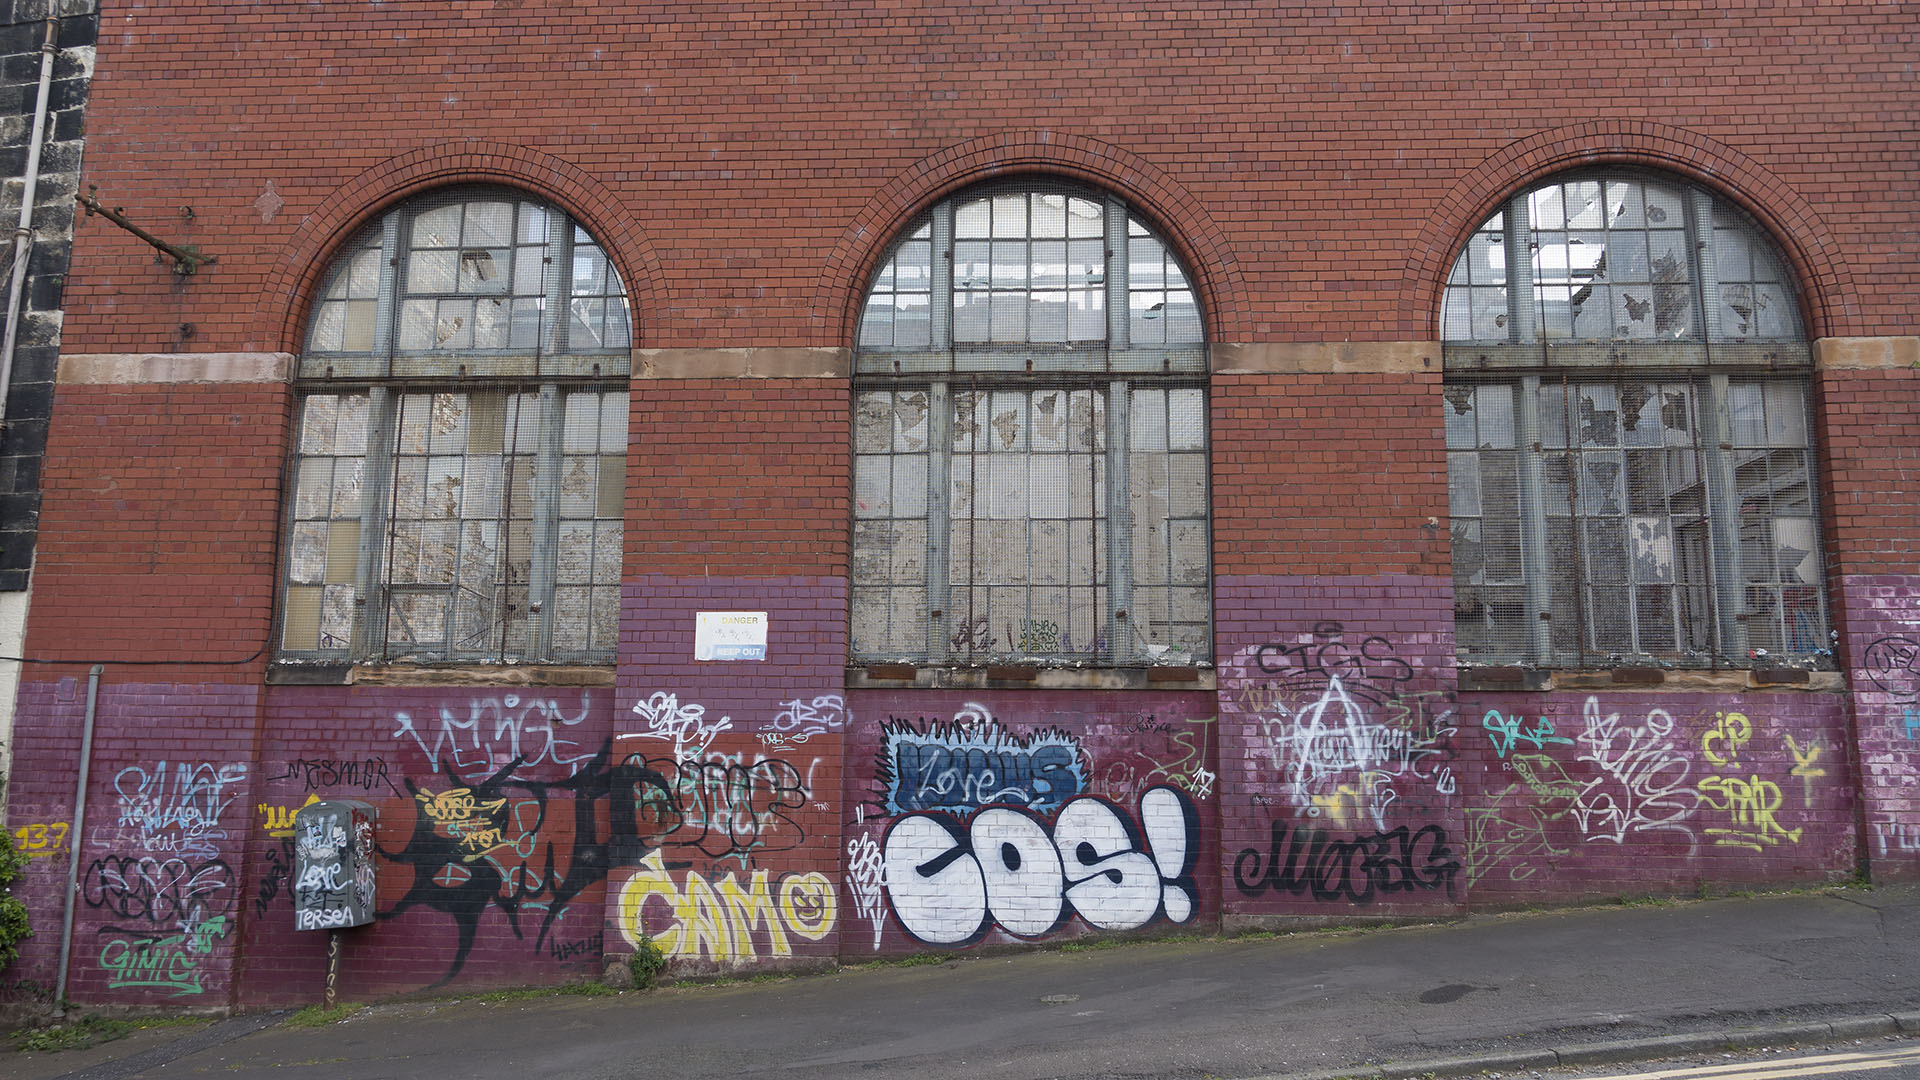 Engine Yard 12